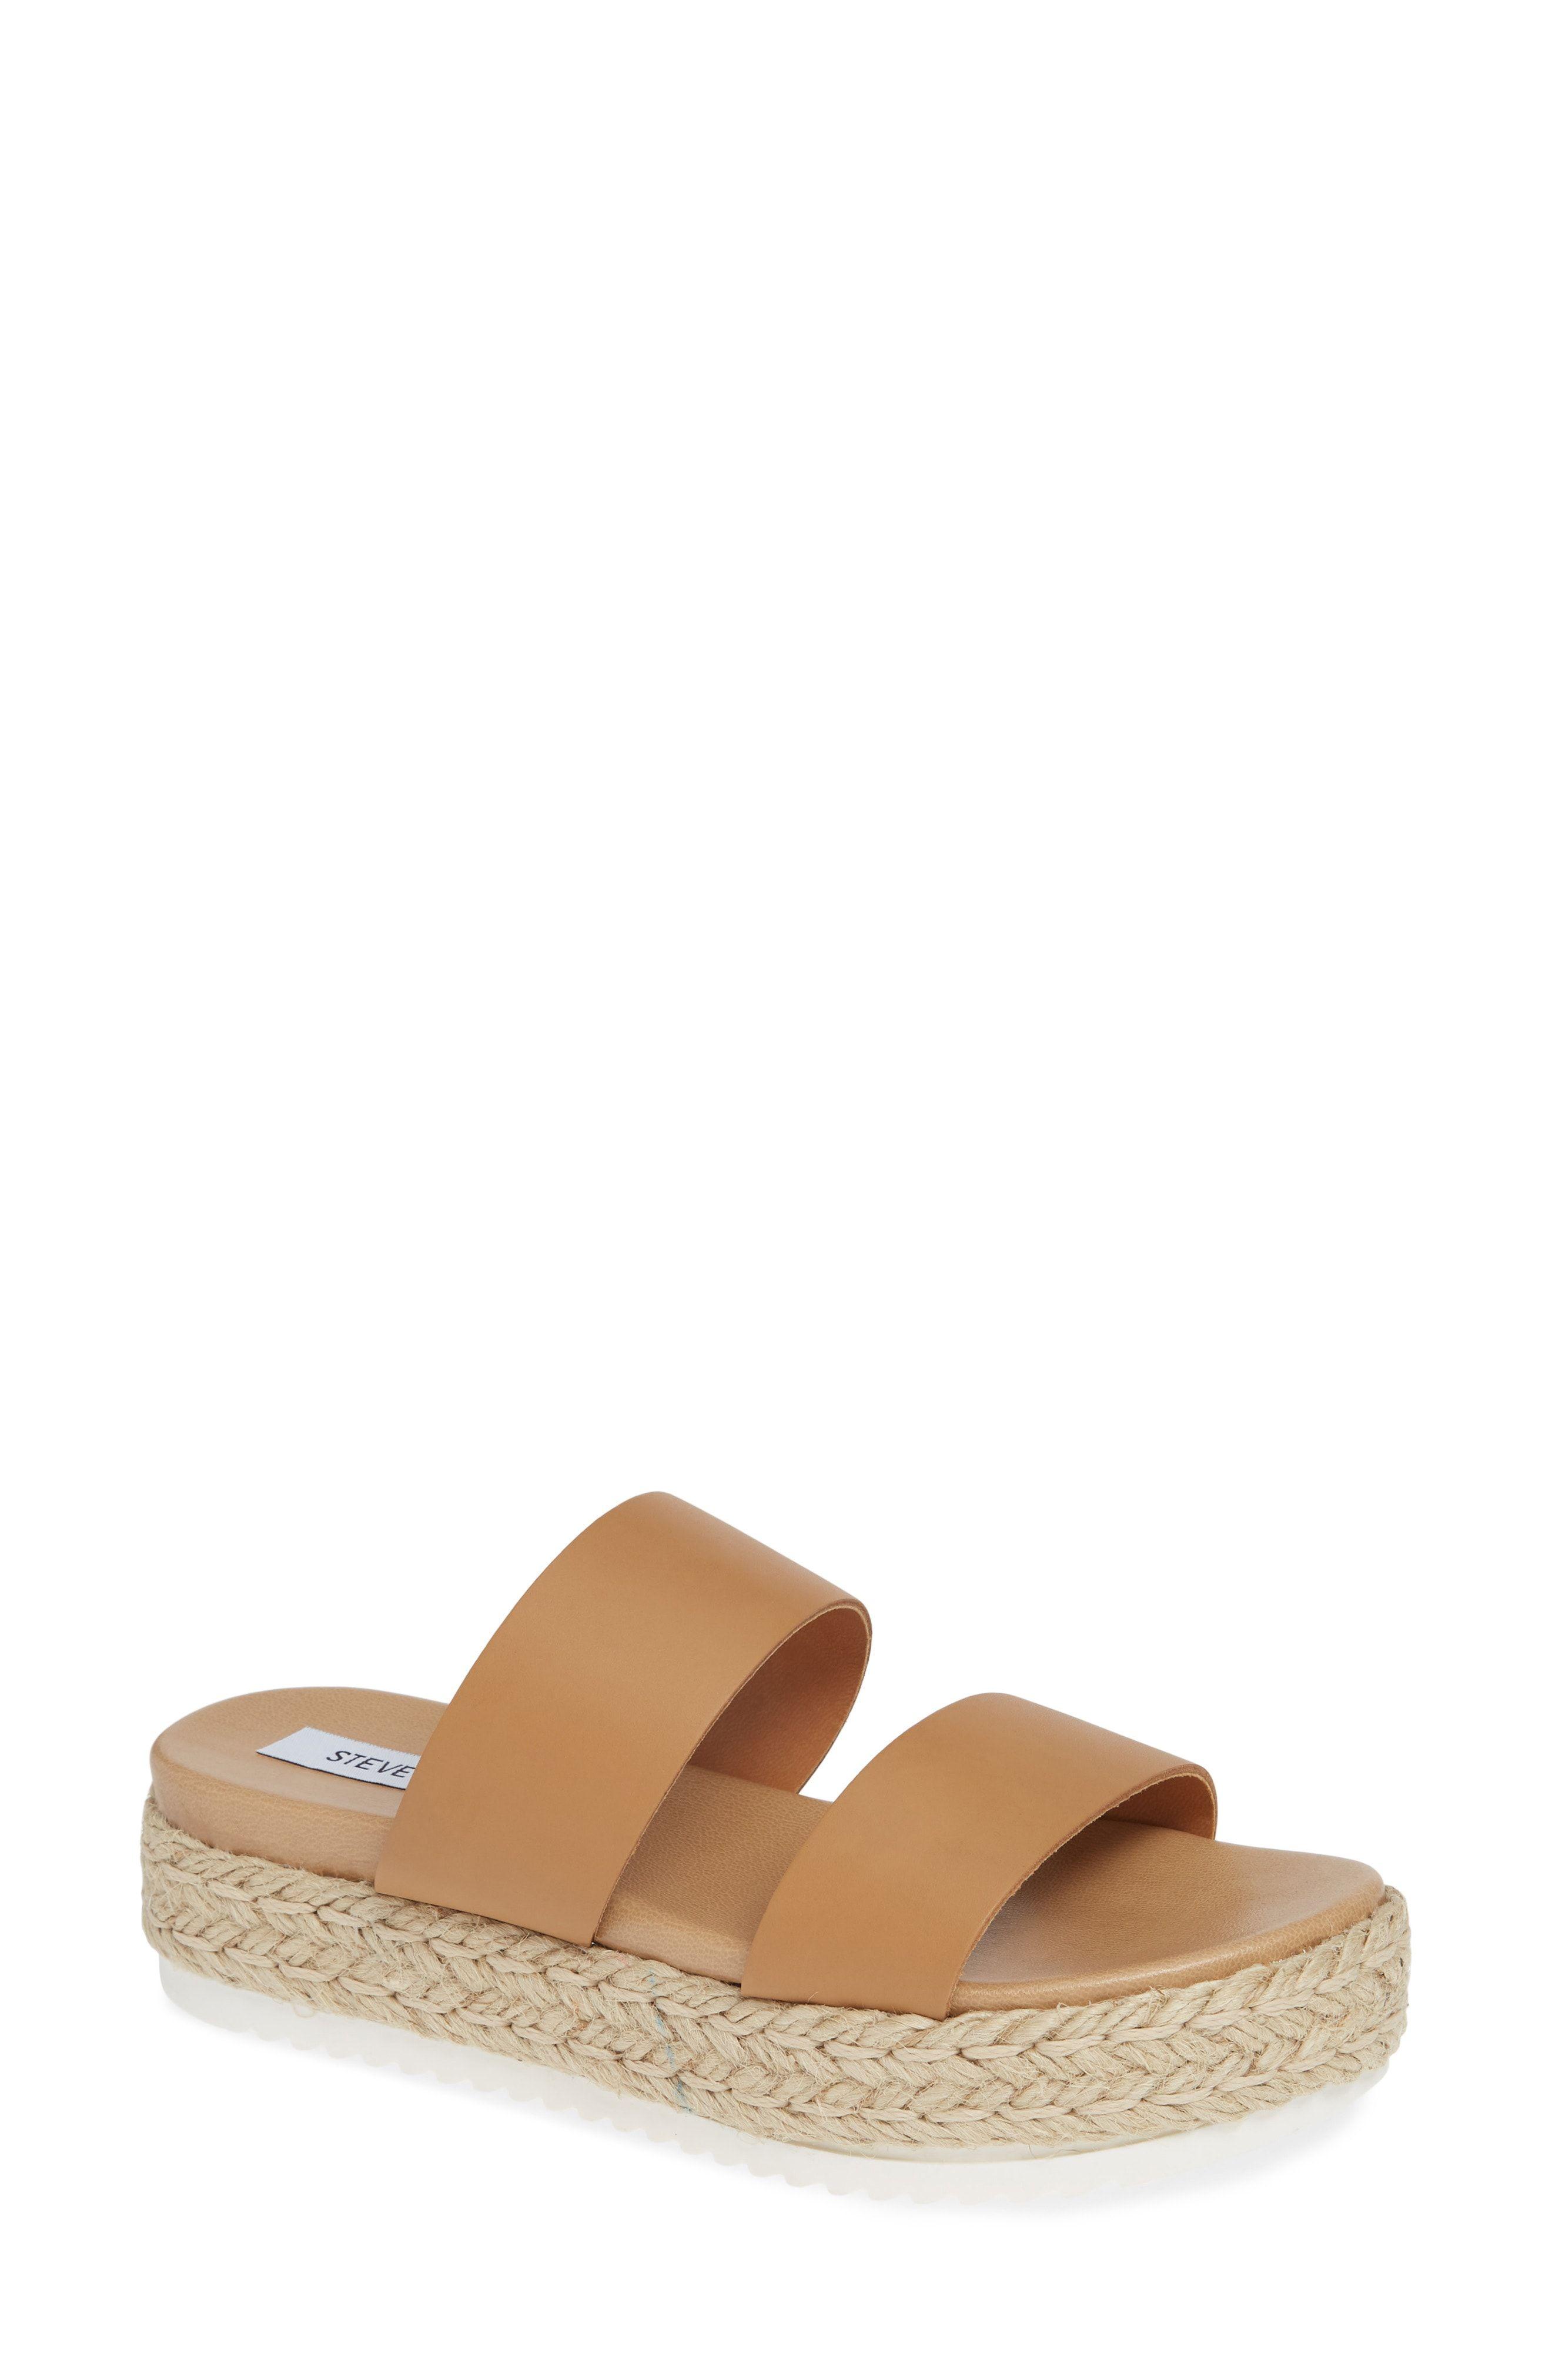 Flat shoes women, Slide sandals